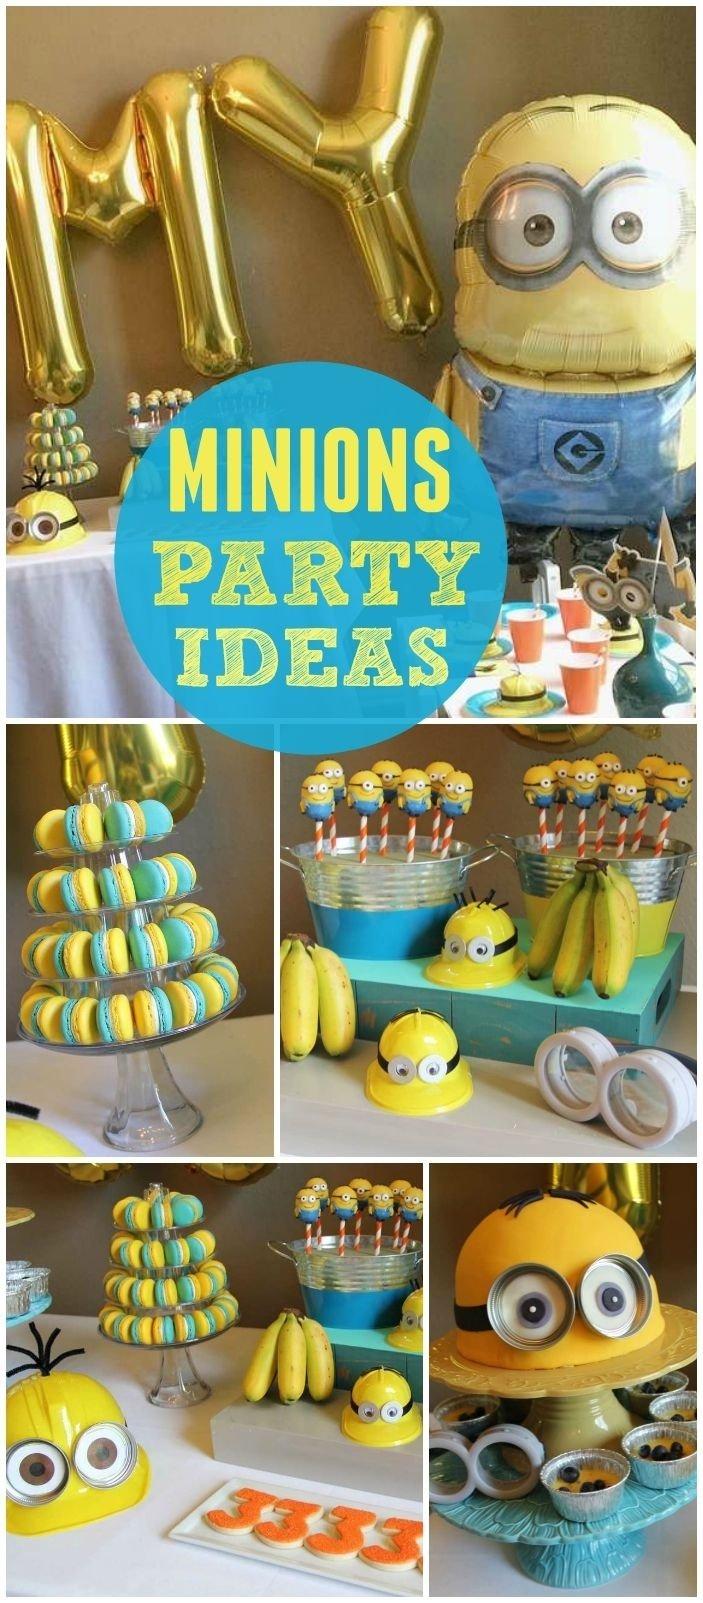 10 Attractive Despicable Me 2 Party Ideas 1174 best despicable me birthday party ideas images on pinterest 2020